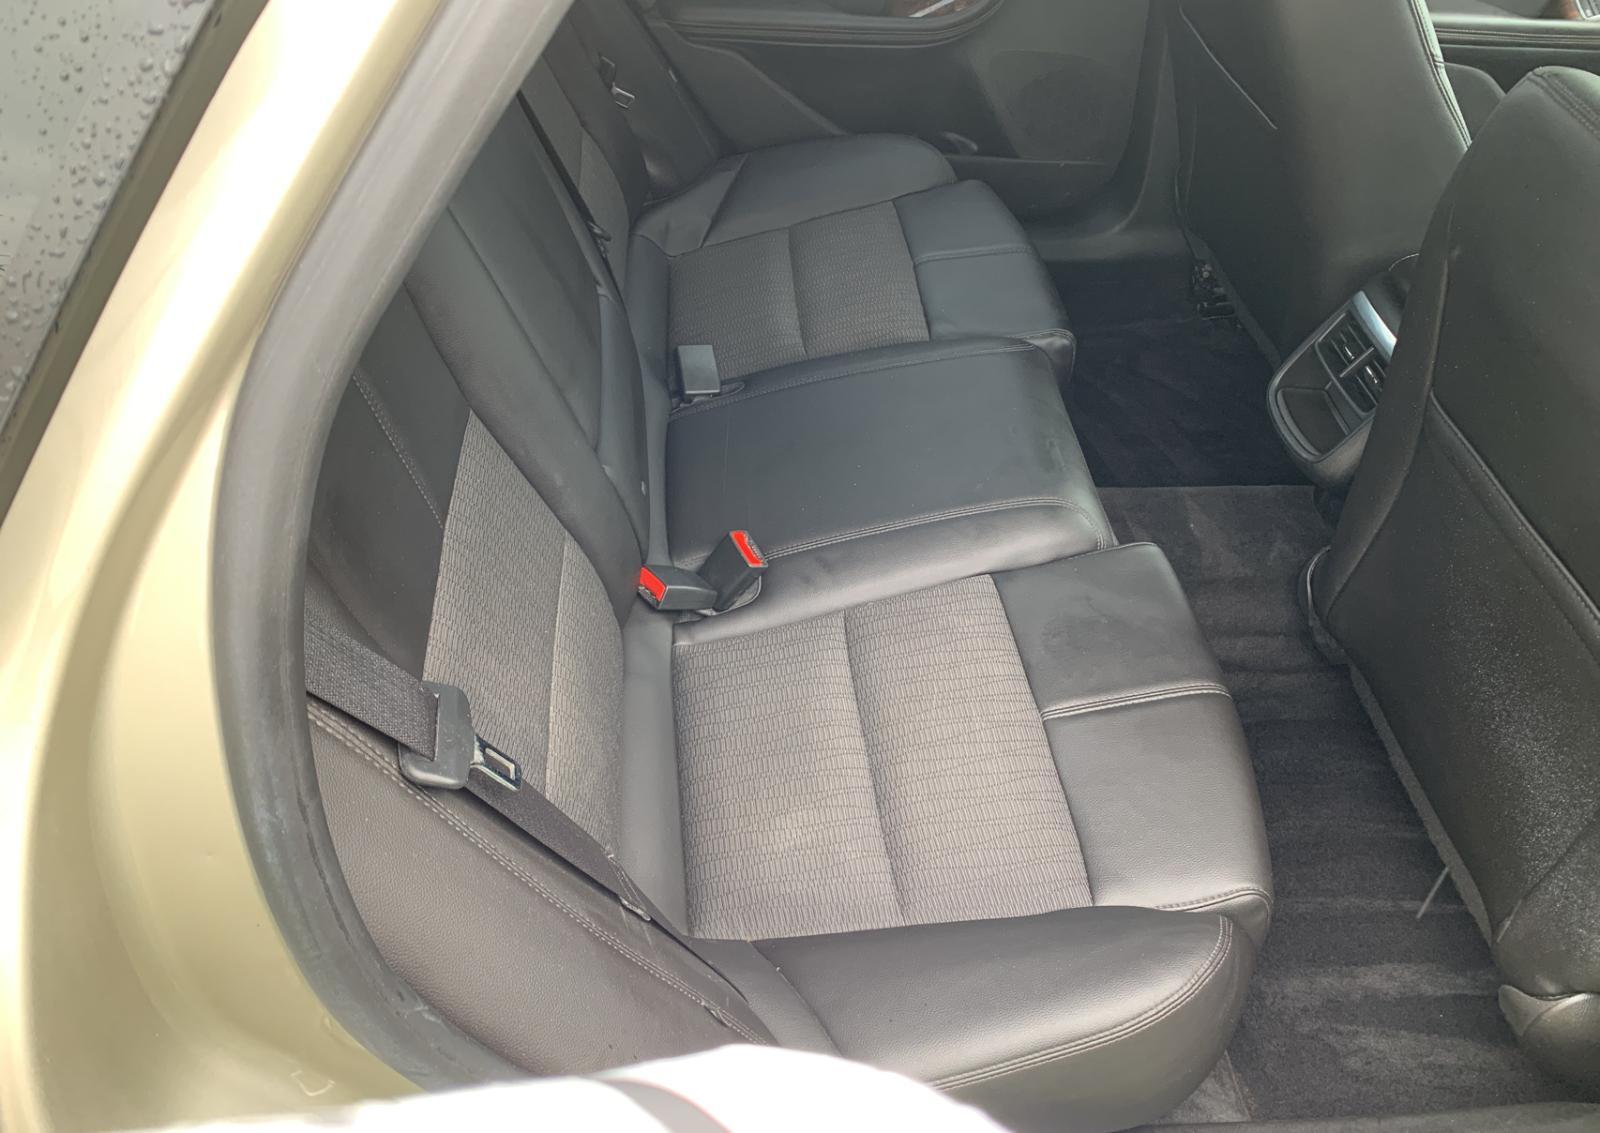 2G1125S37F9275522 - 2015 Chevrolet Impala Lt 3.6L detail view